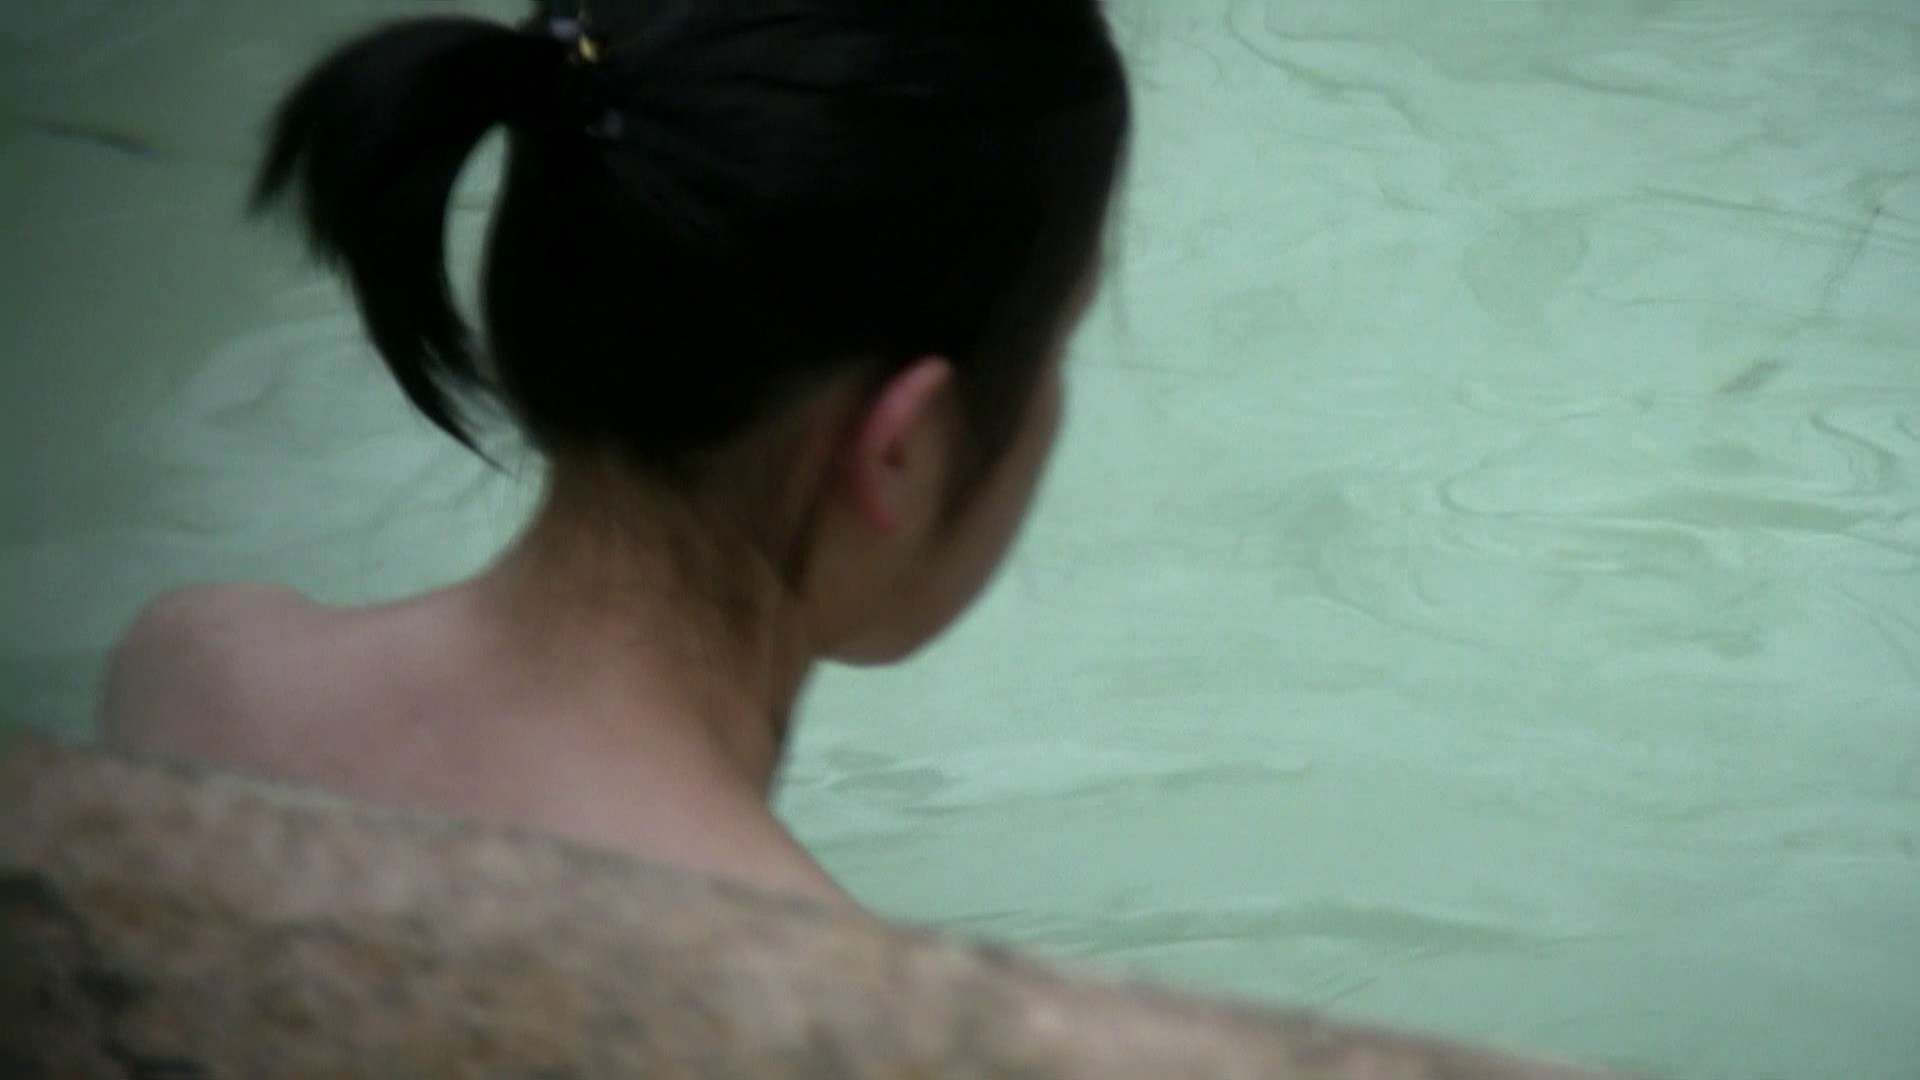 Aquaな露天風呂Vol.656 露天   HなOL  71pic 25